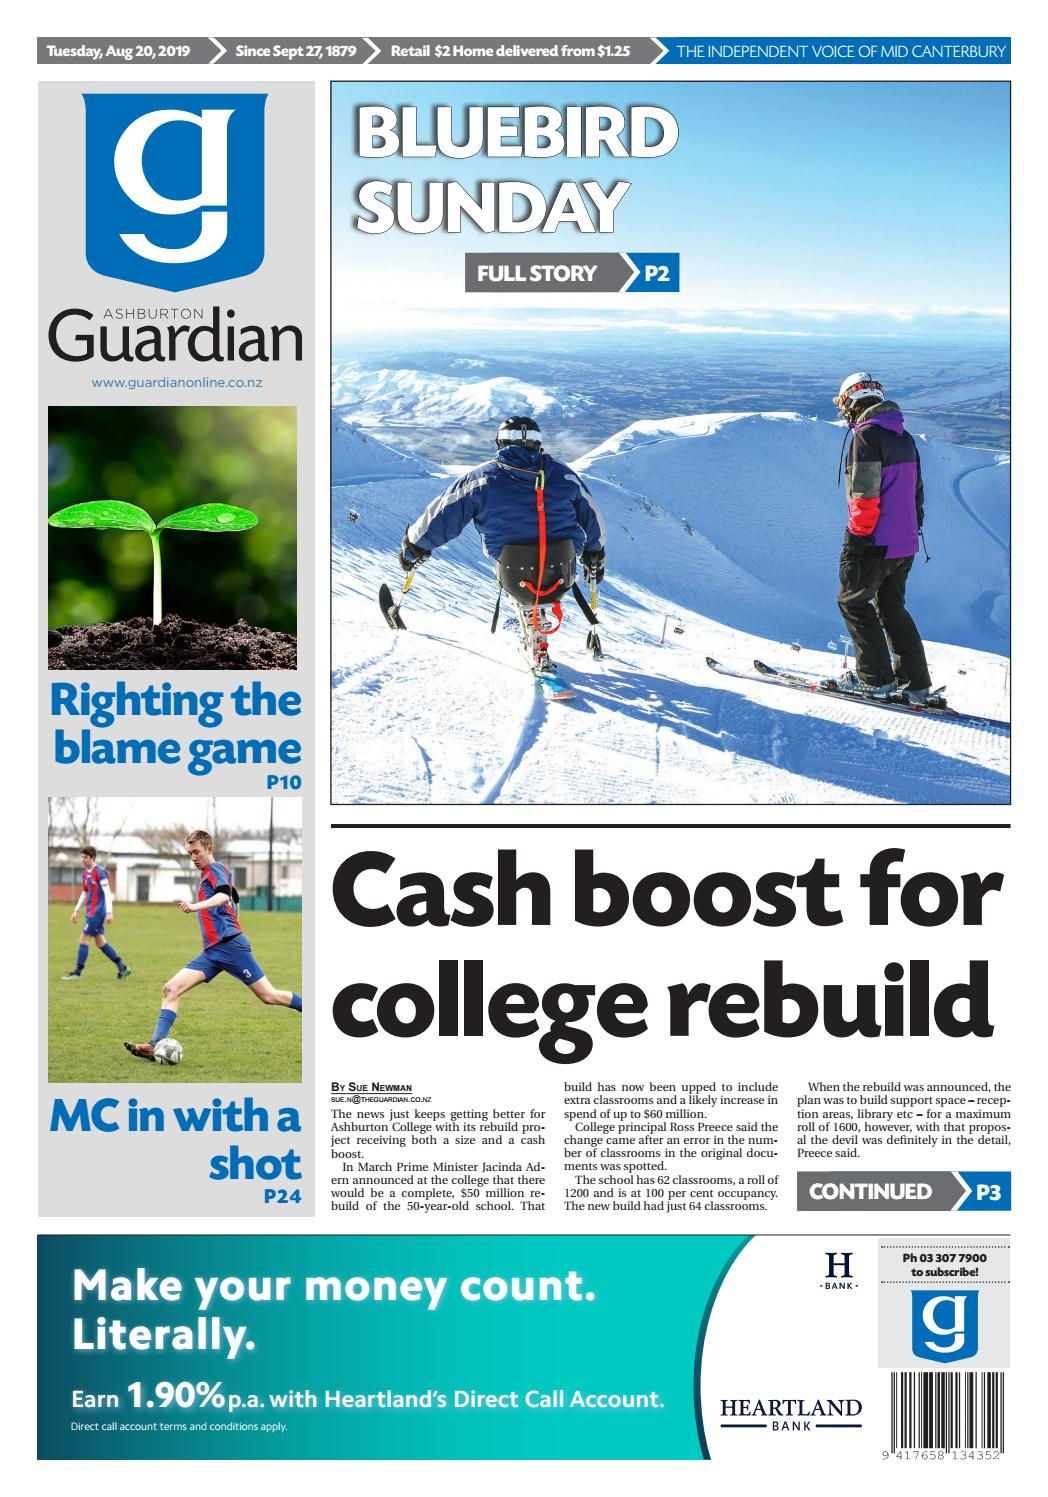 Ashburton Guardian, Tuesday, August 20, 2019 by Ashburton